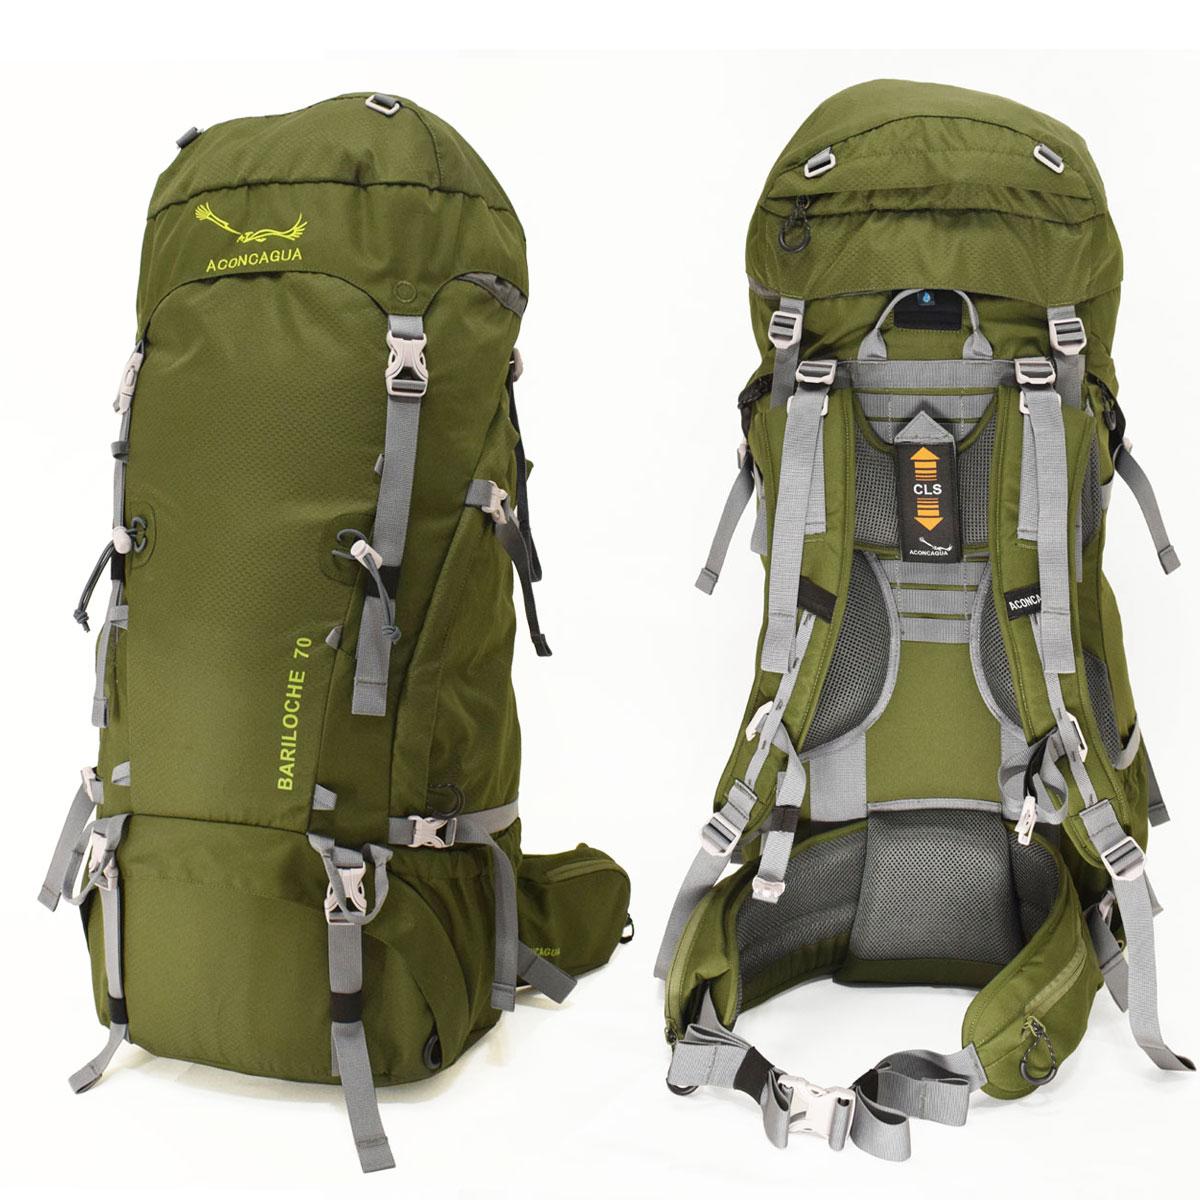 70L 大型 大容量 リュックサック バックパック 登山用ザック 旅行 キャンプ 山小屋泊 アウトドアギア トレッキングパック Bariloche バリローチェ70 Aconcagua アコンカグア 送料無料